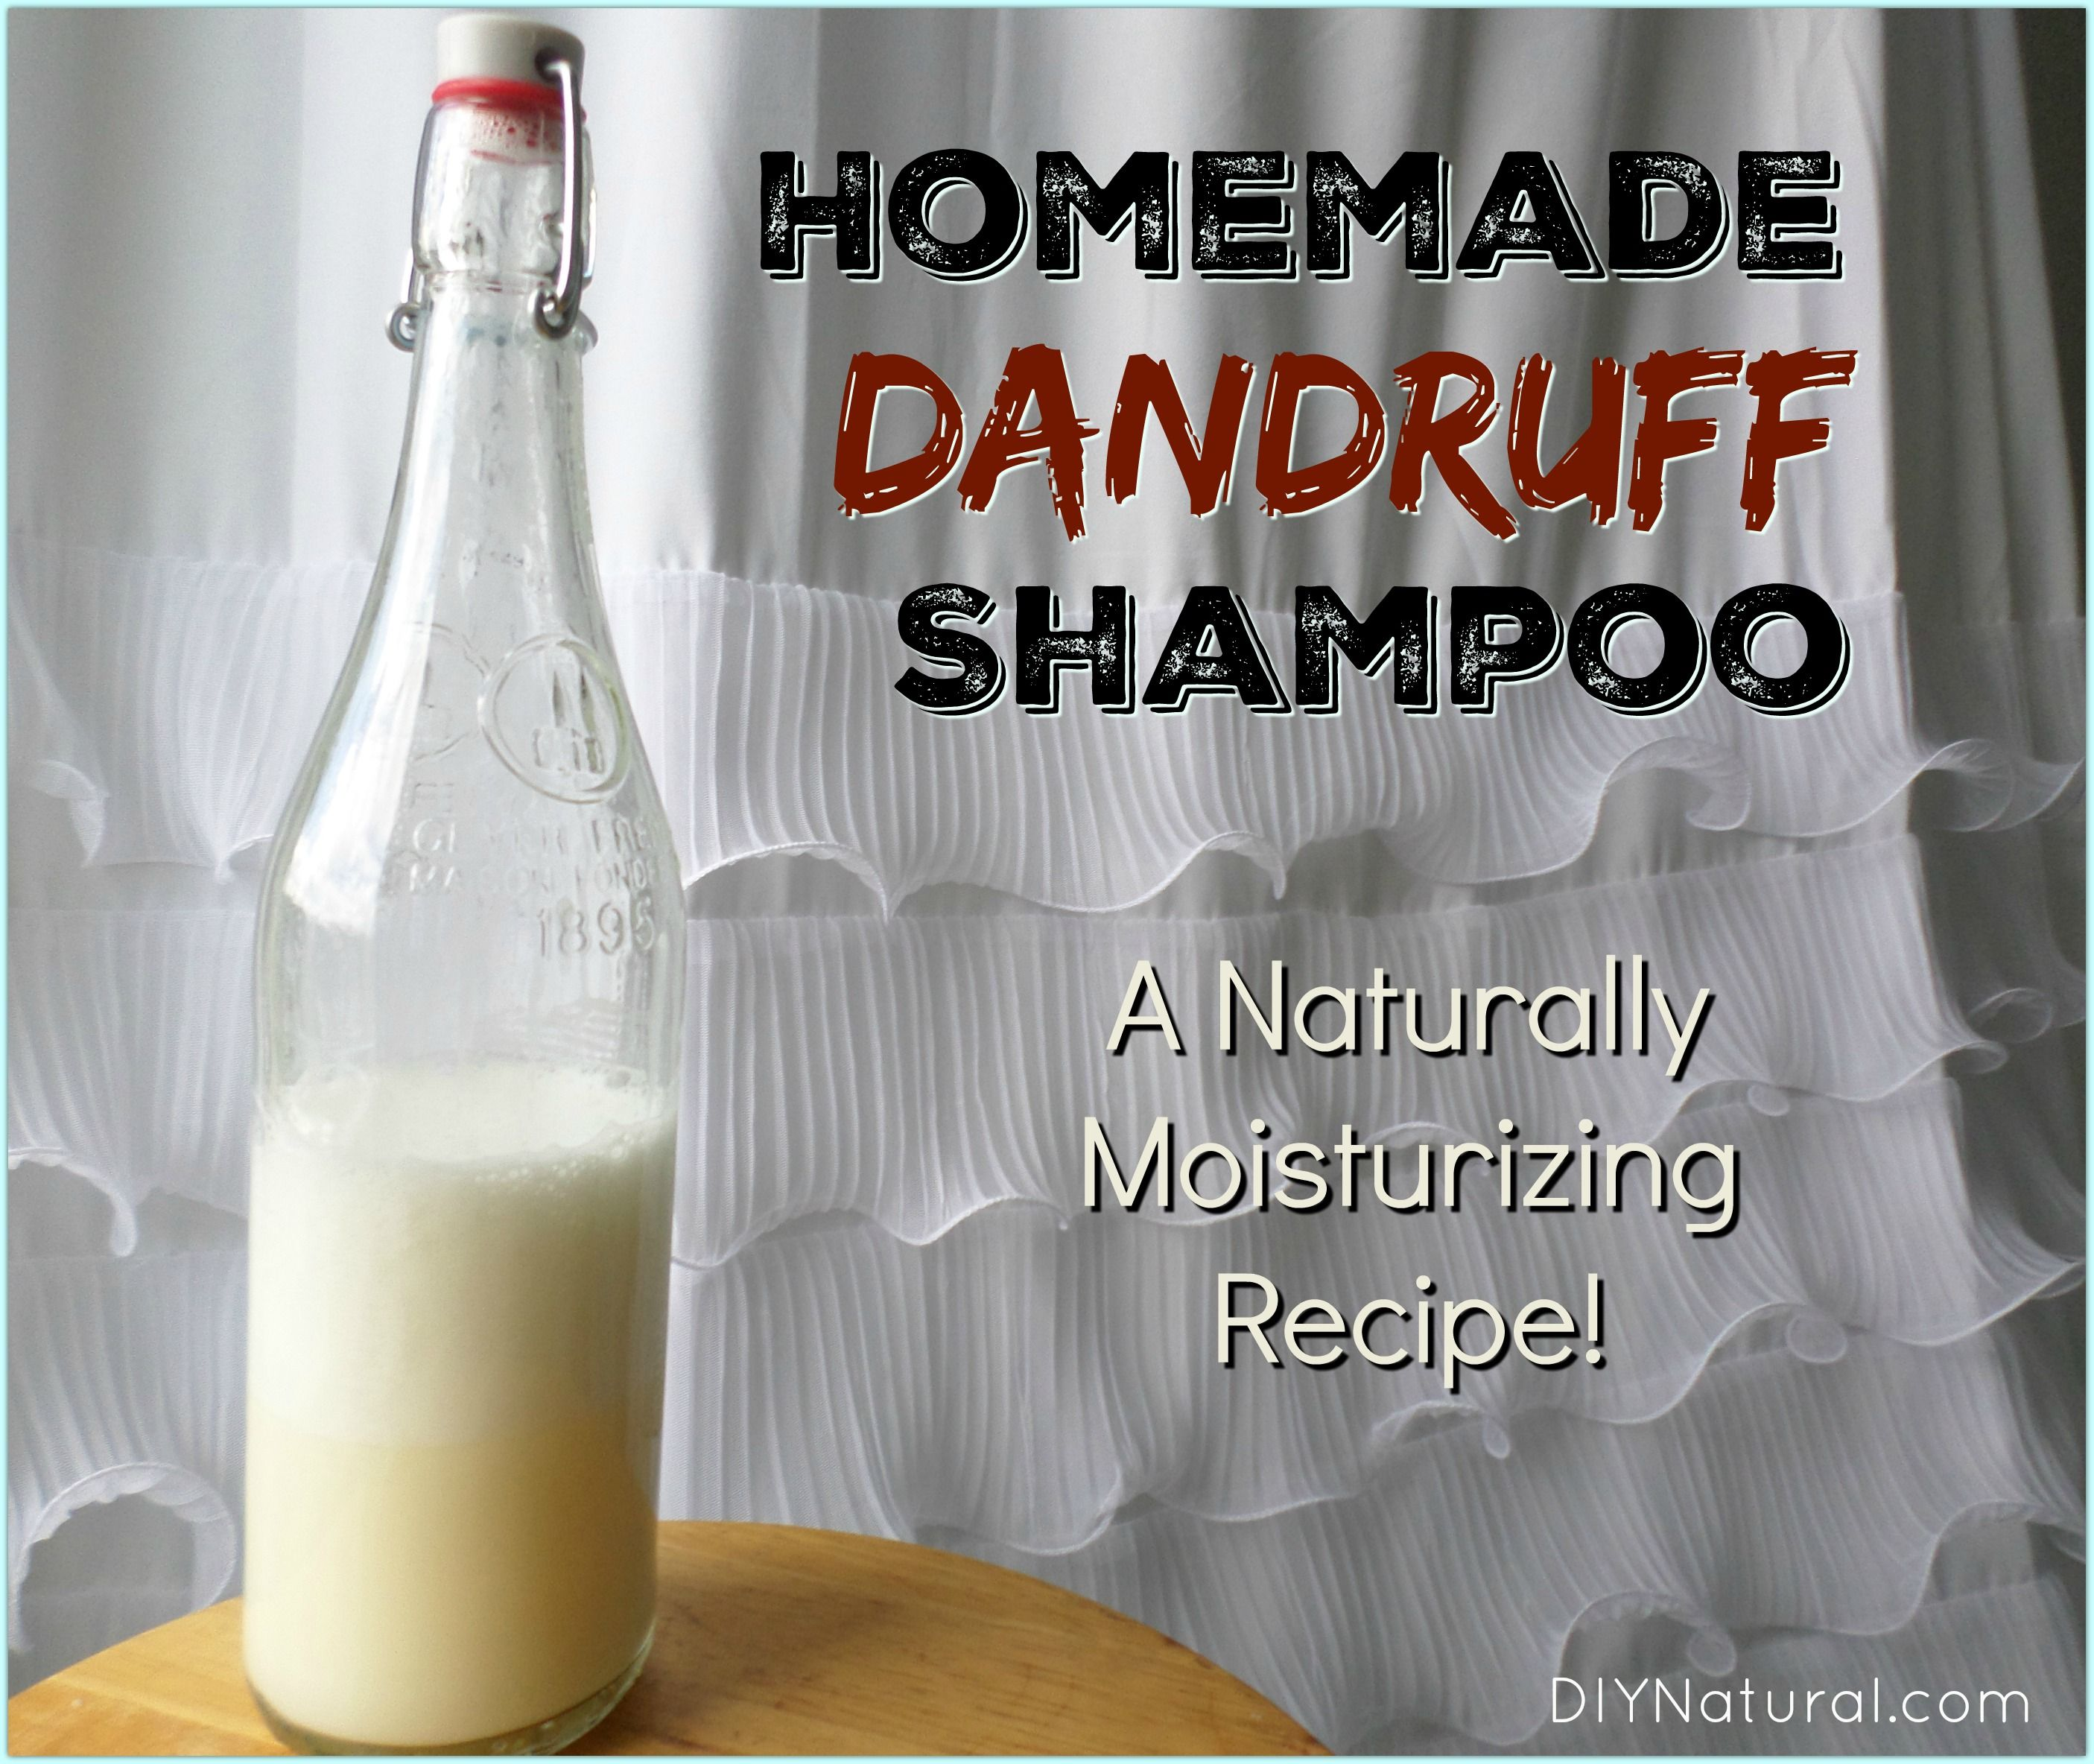 Moisturizing Homemade Dandruff Shampoo Recipe Home